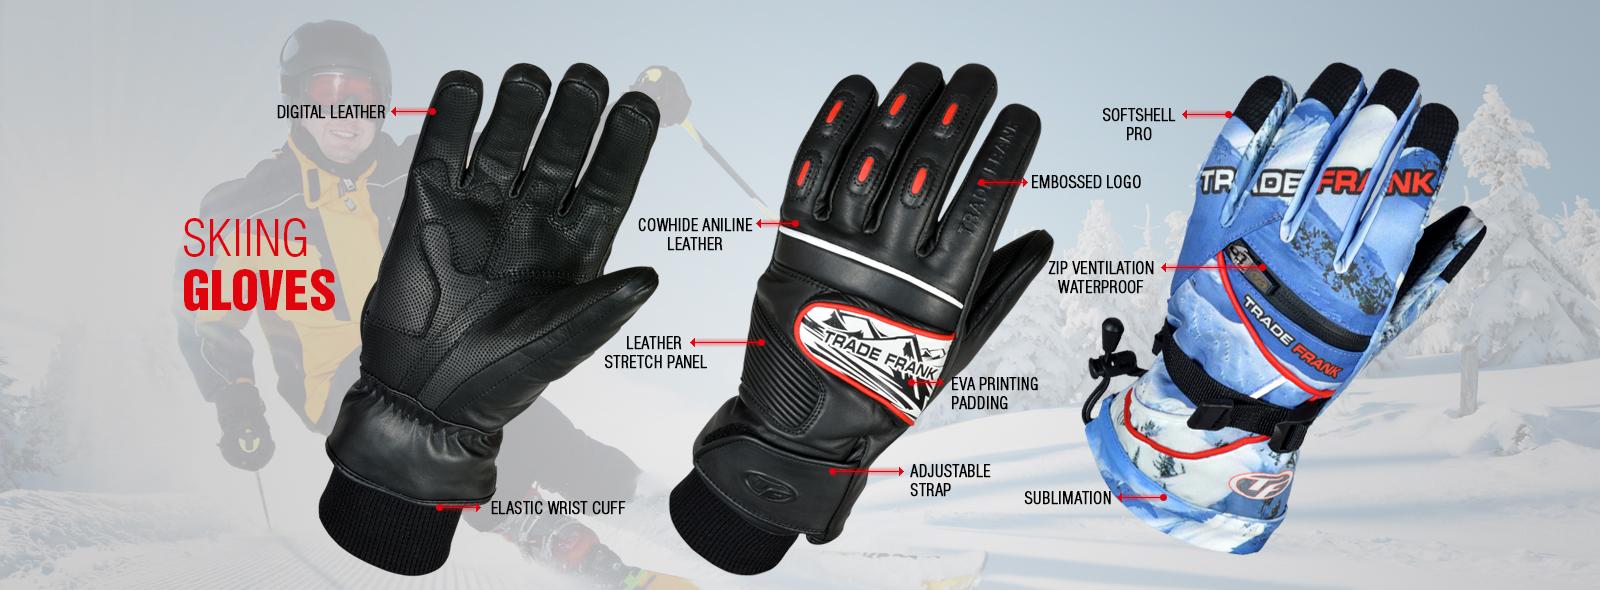 SKI Gloves-3